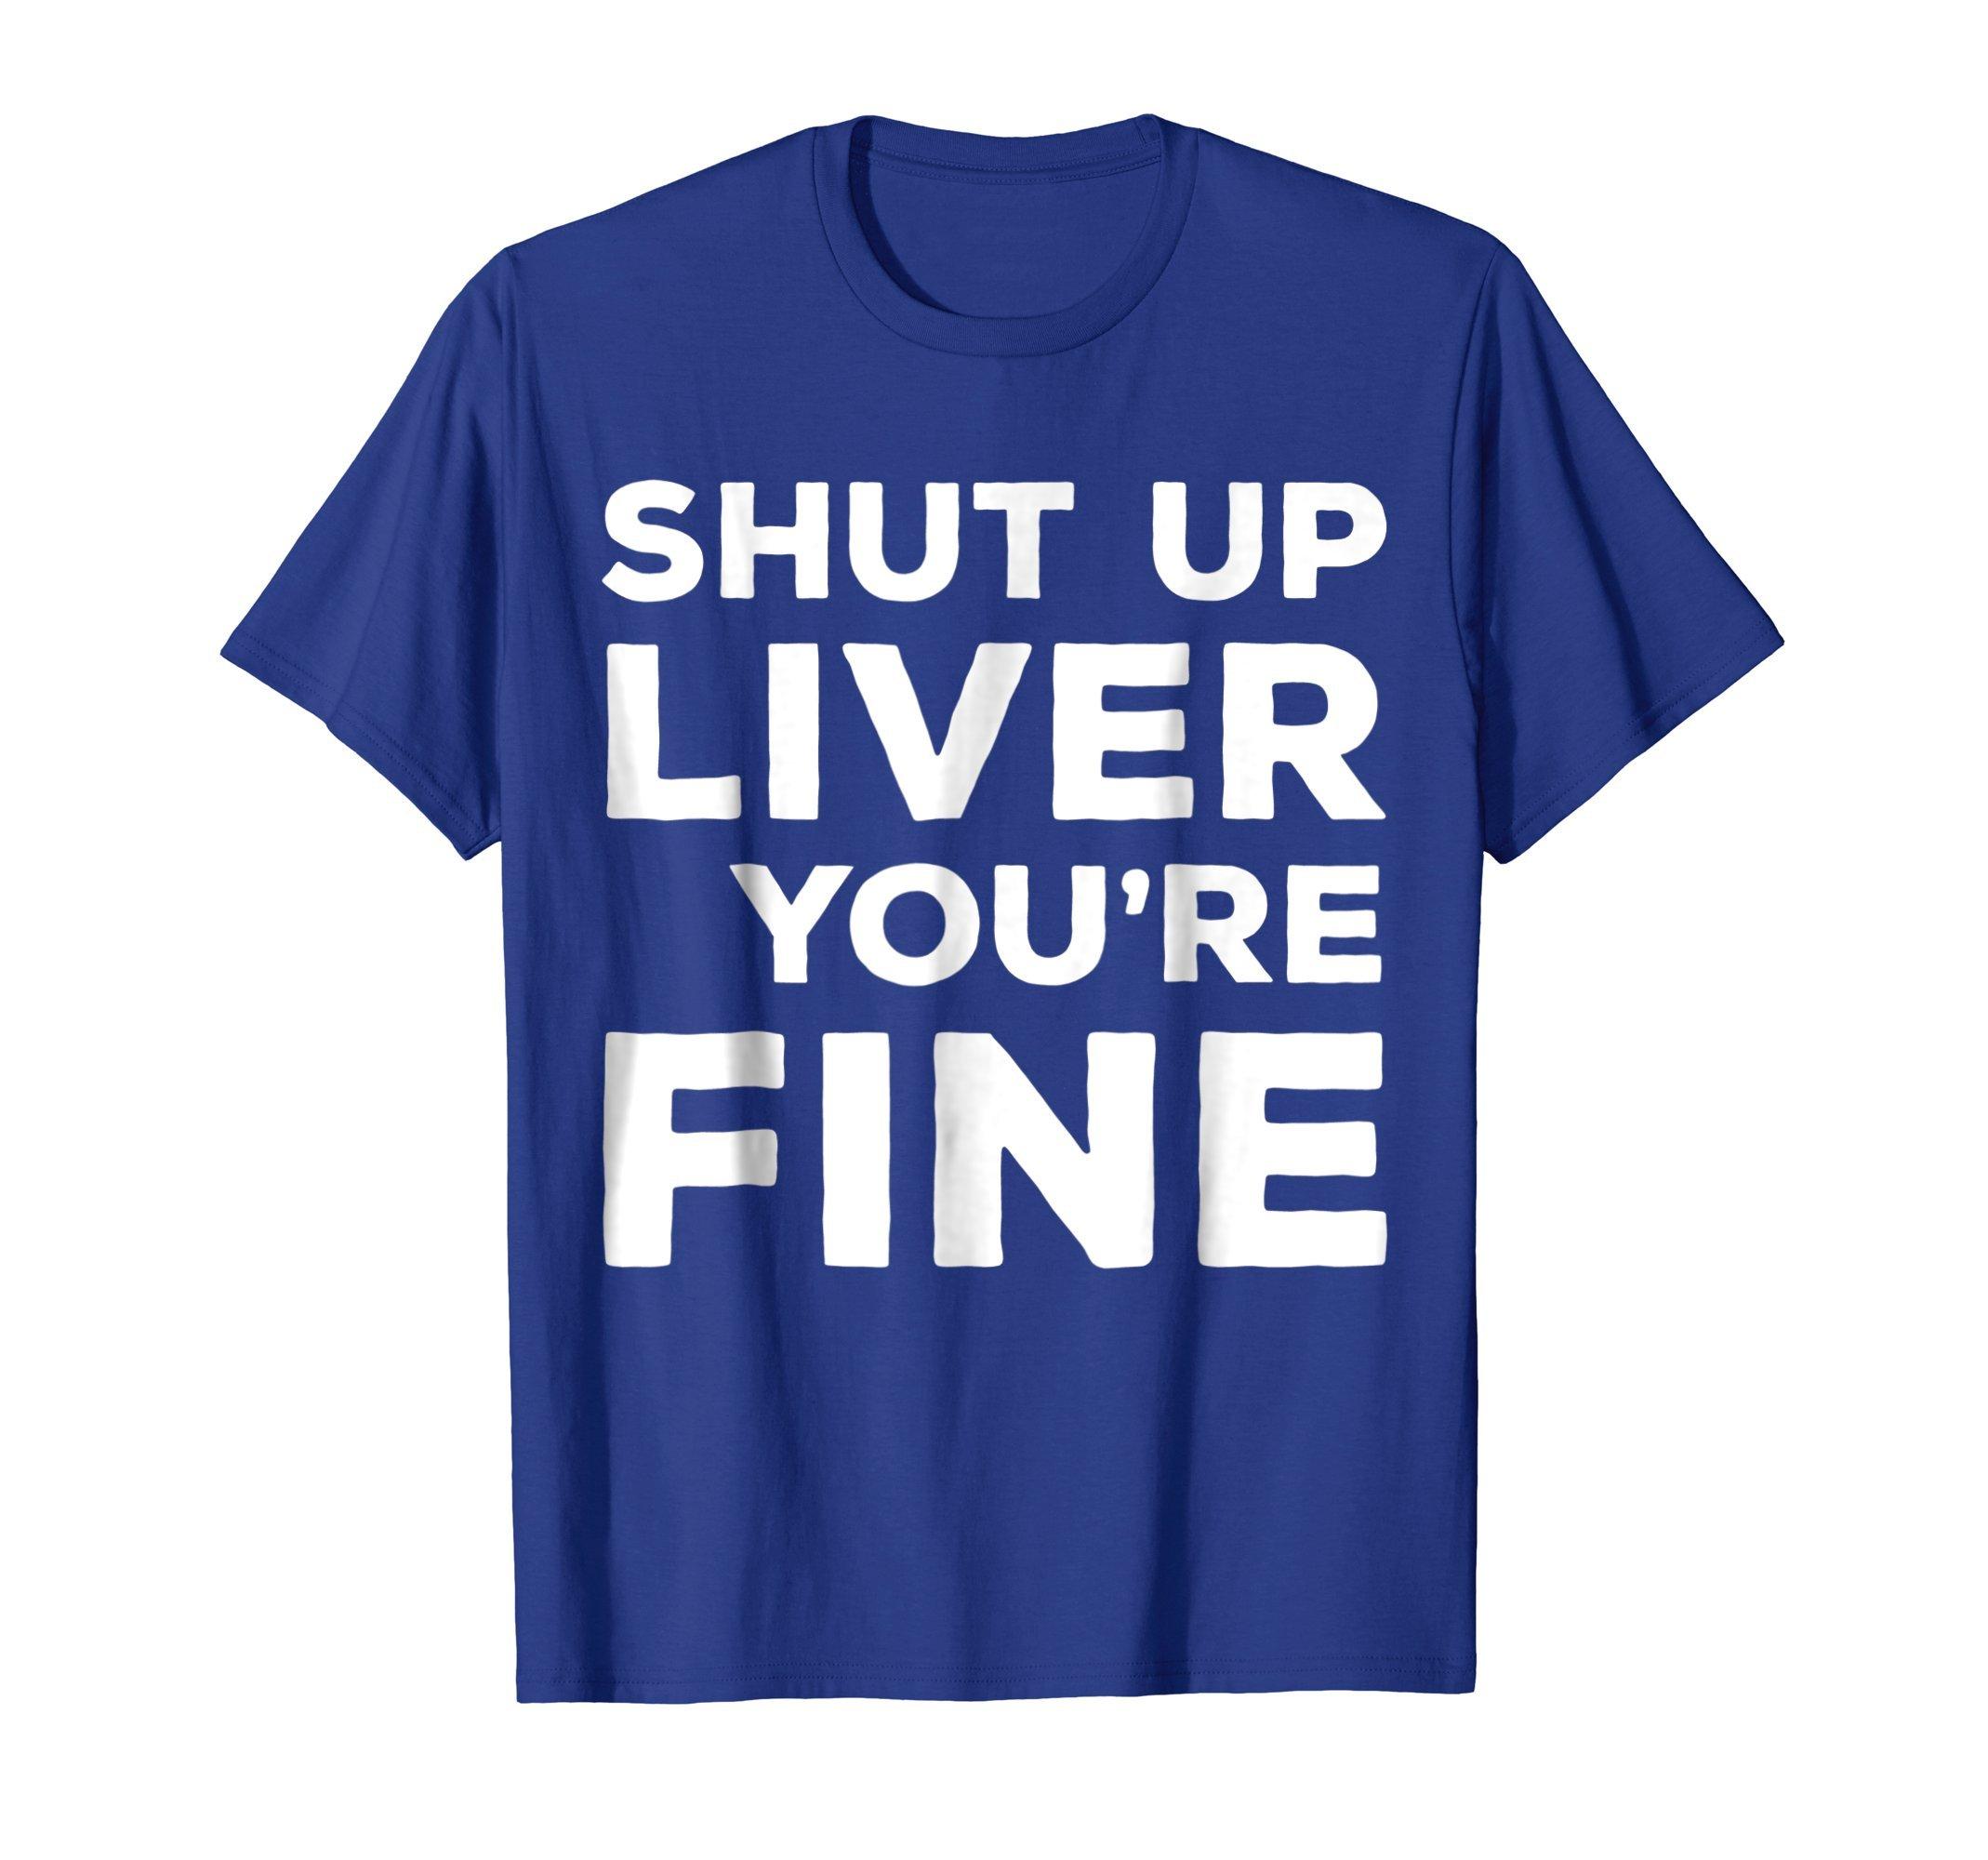 Mens Shut Up Liver You're Fine T-Shirt Funny Drinking Shirt Large Royal Blue